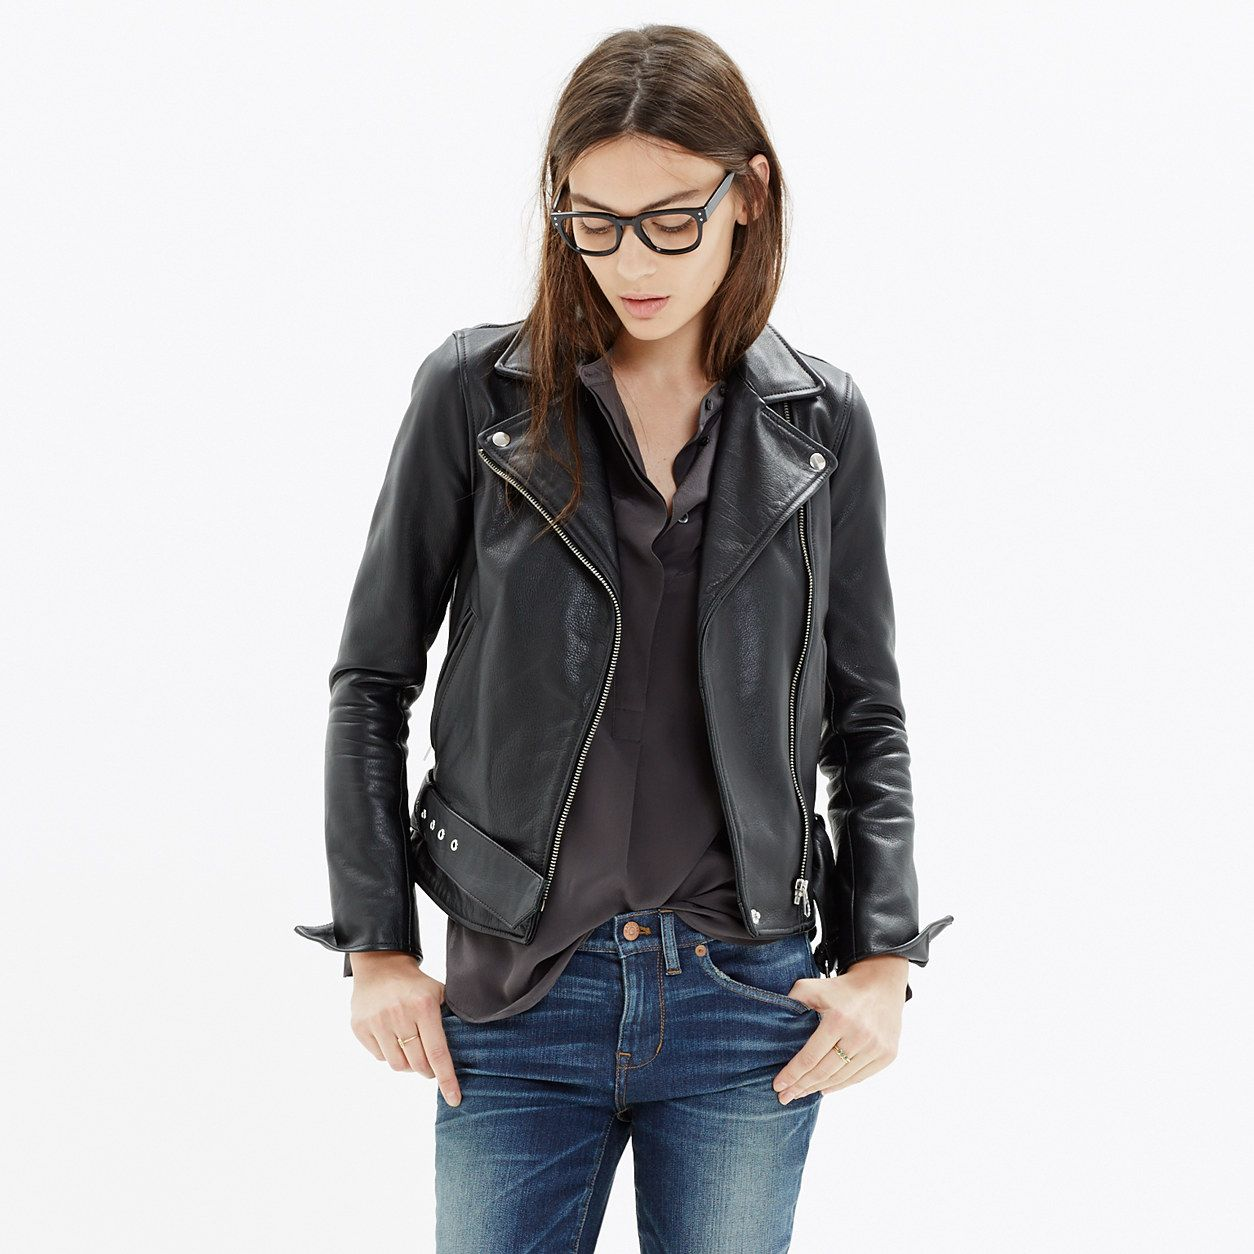 Ultimate Leather Motorcycle Jacket Best Leather Jackets Clothes Denim Jacket Women [ 1254 x 1254 Pixel ]